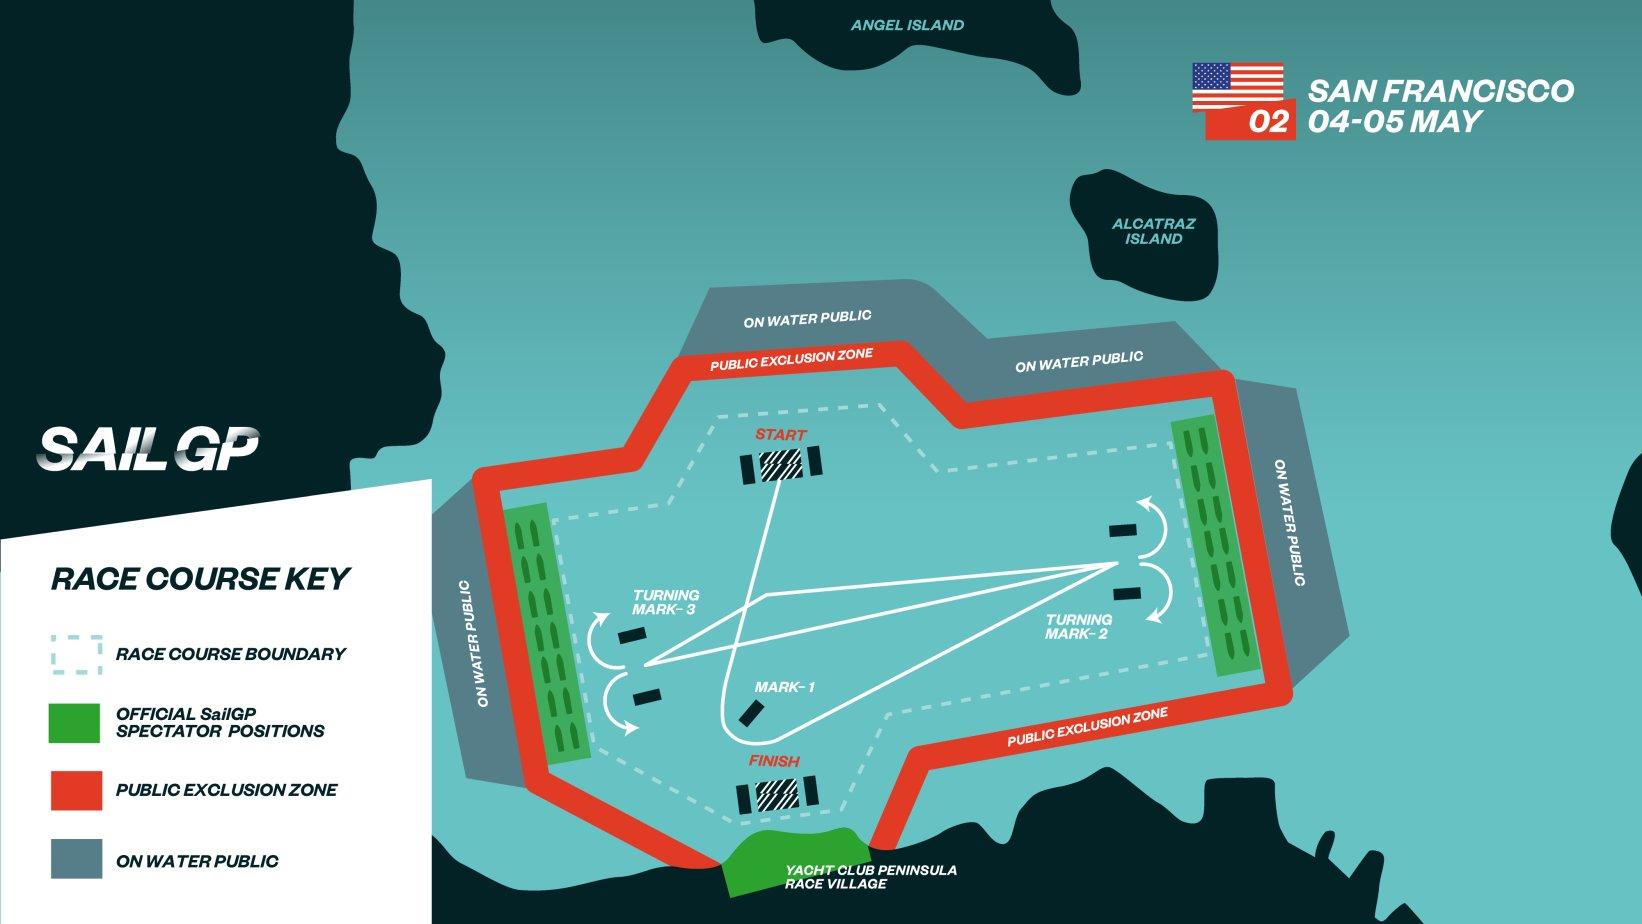 sanfran_racemap_022019_02-png